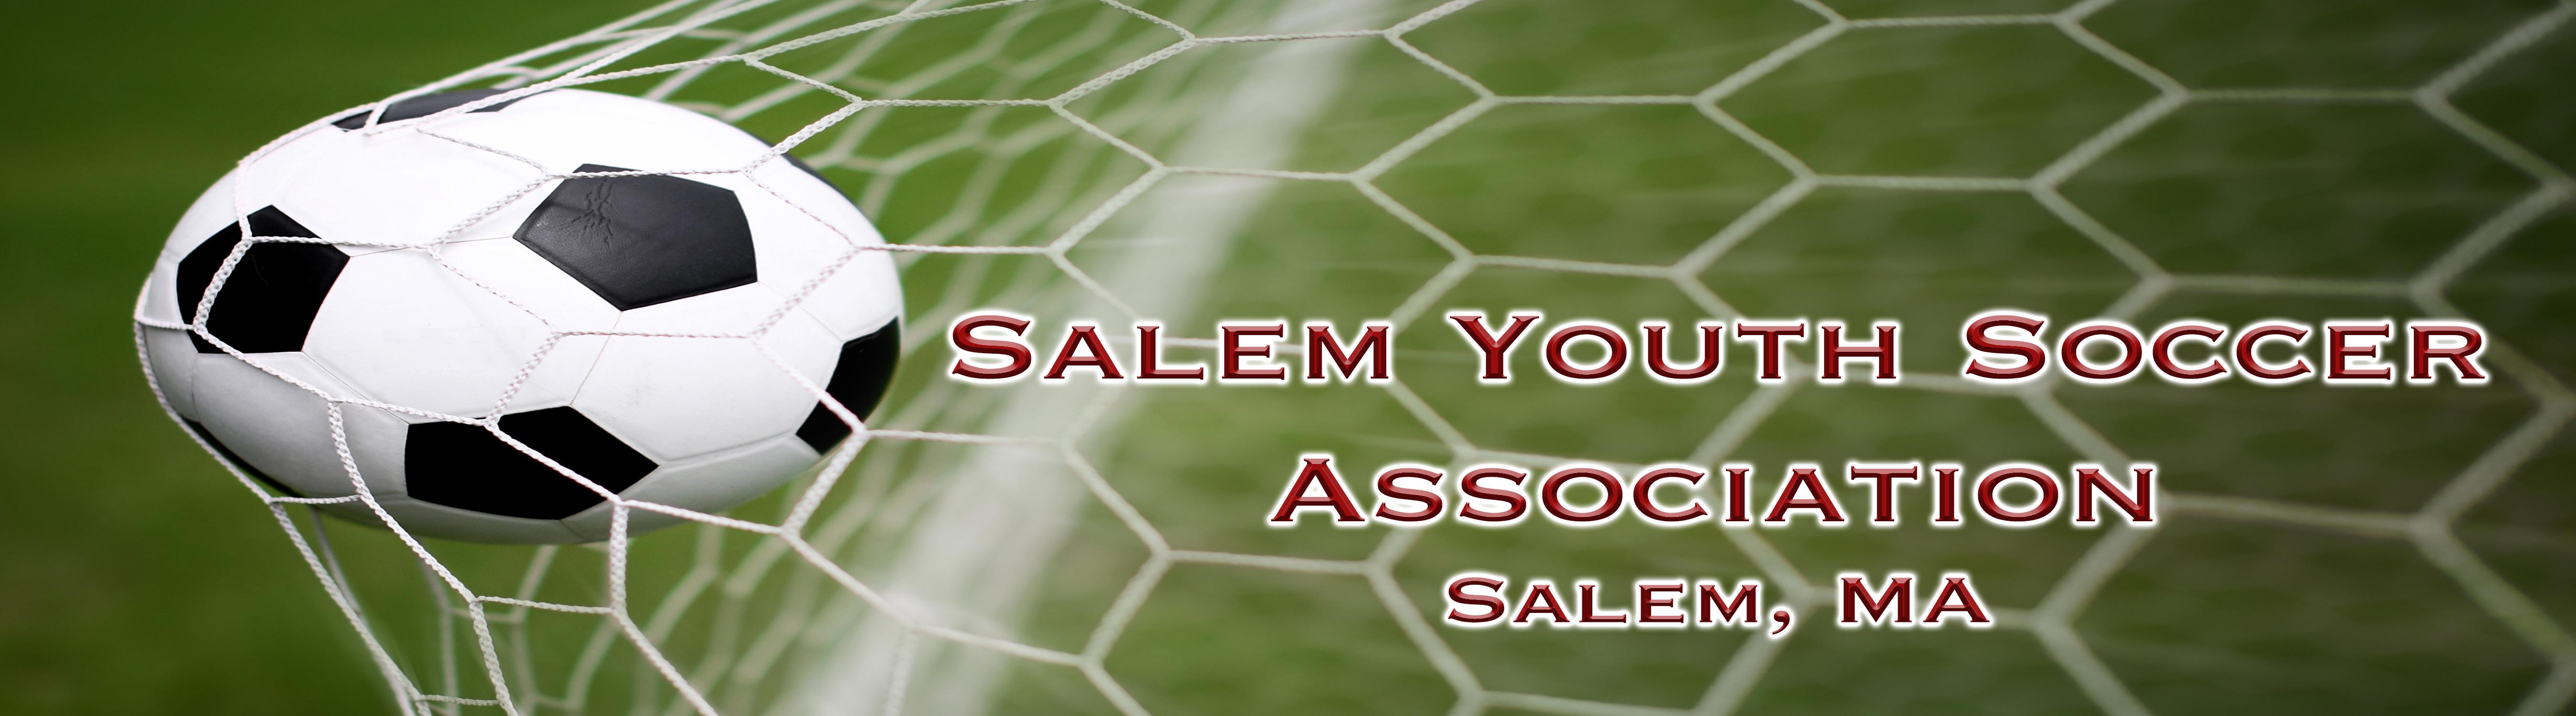 Salem Youth Soccer, Soccer, Goal, Field